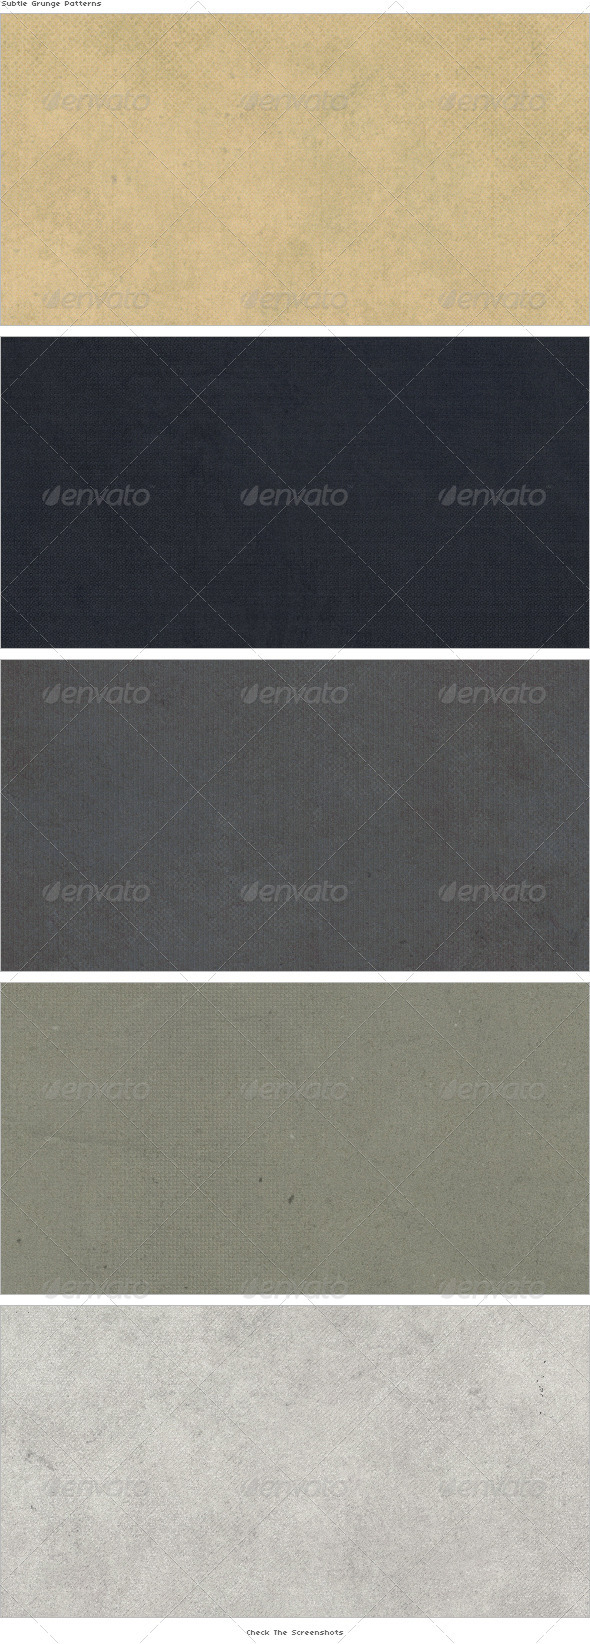 GraphicRiver Subtle Grunge Patterns 3047979